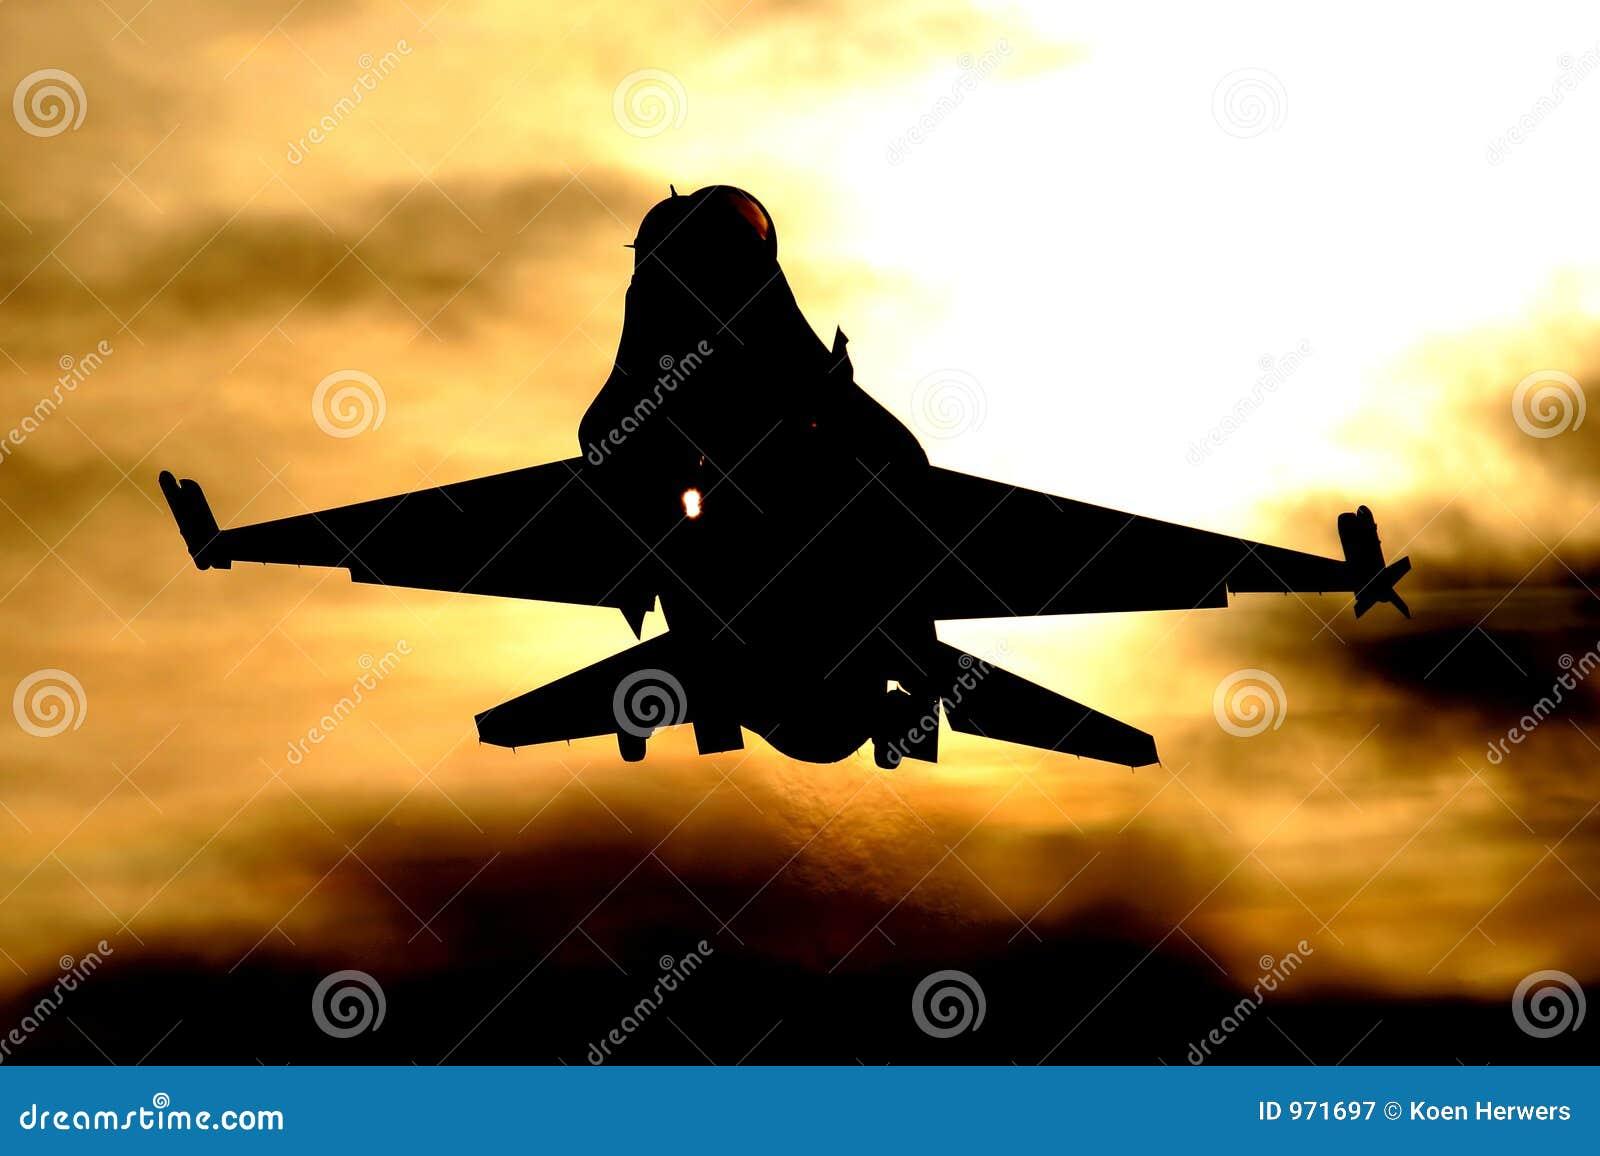 F-16 die bij zonsondergang landt